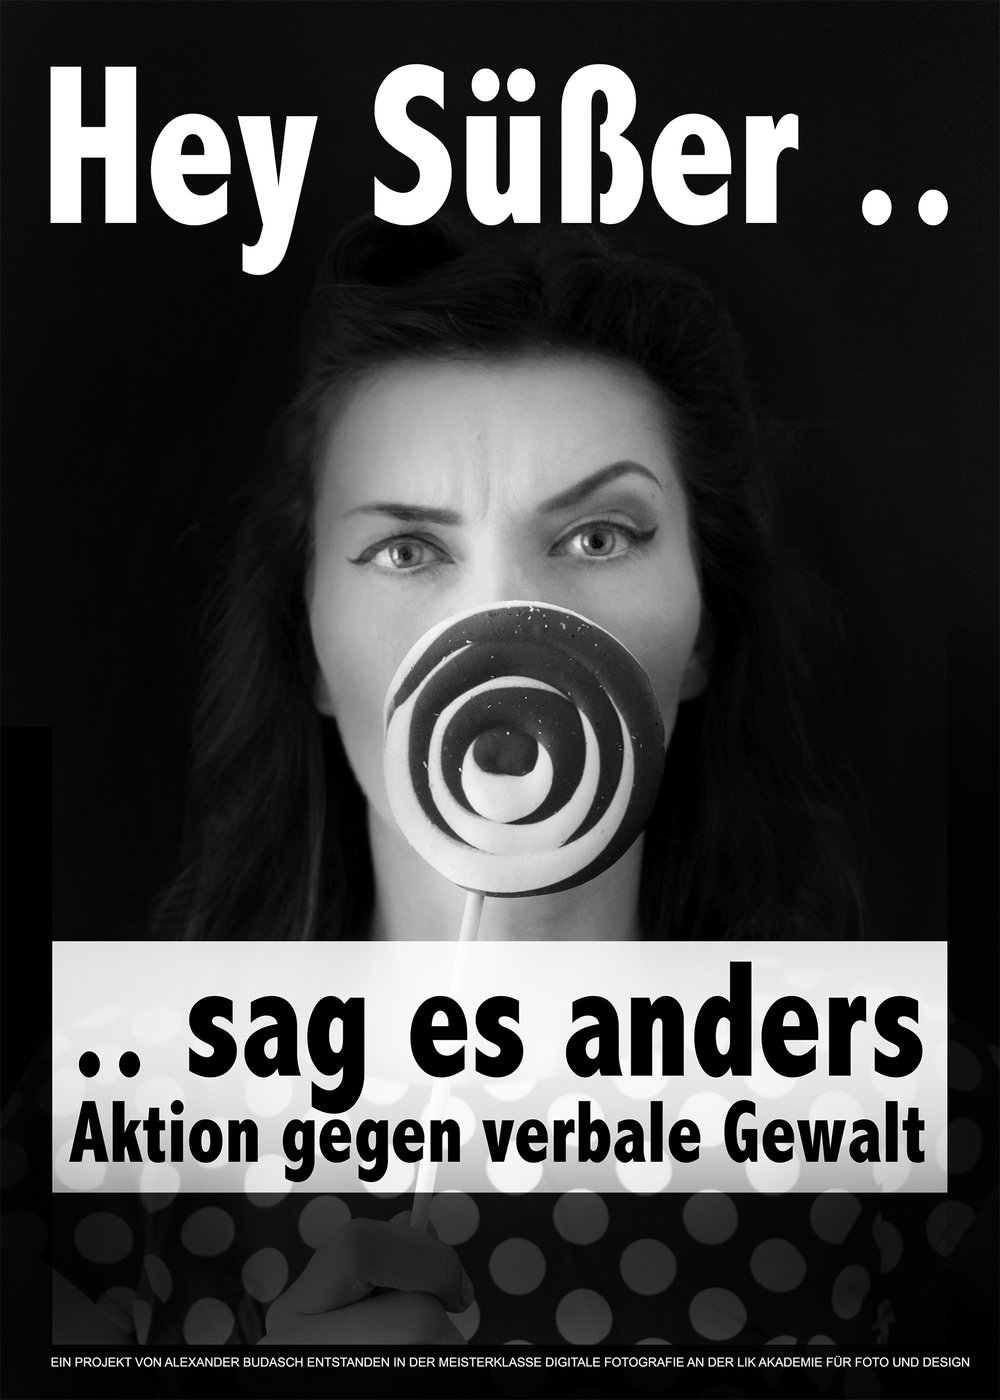 ABudasch_LIK_MK3-4-9.jpg